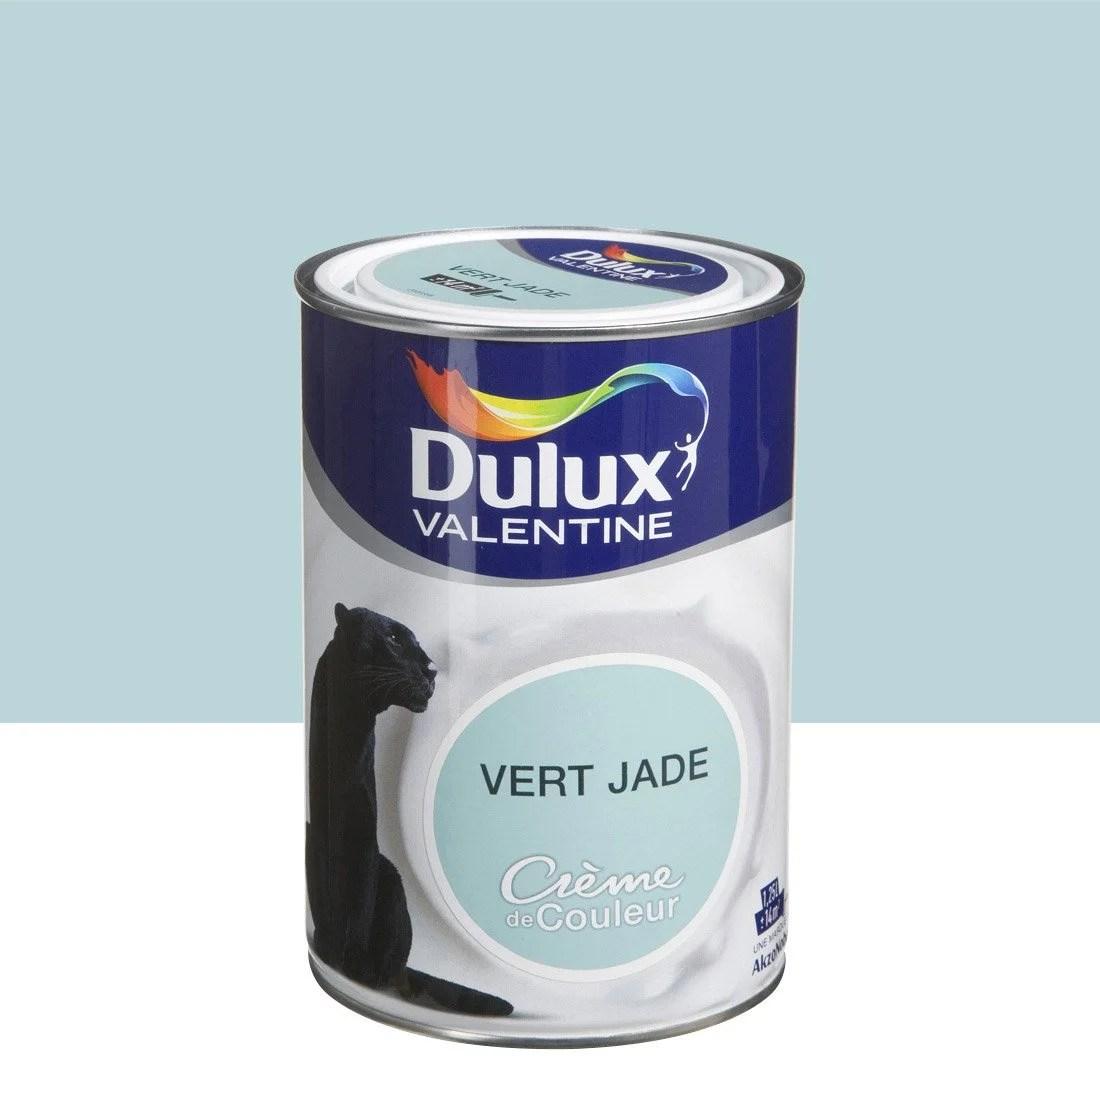 Peinture Vert Jade Satin DULUX VALENTINE Crme De Couleur